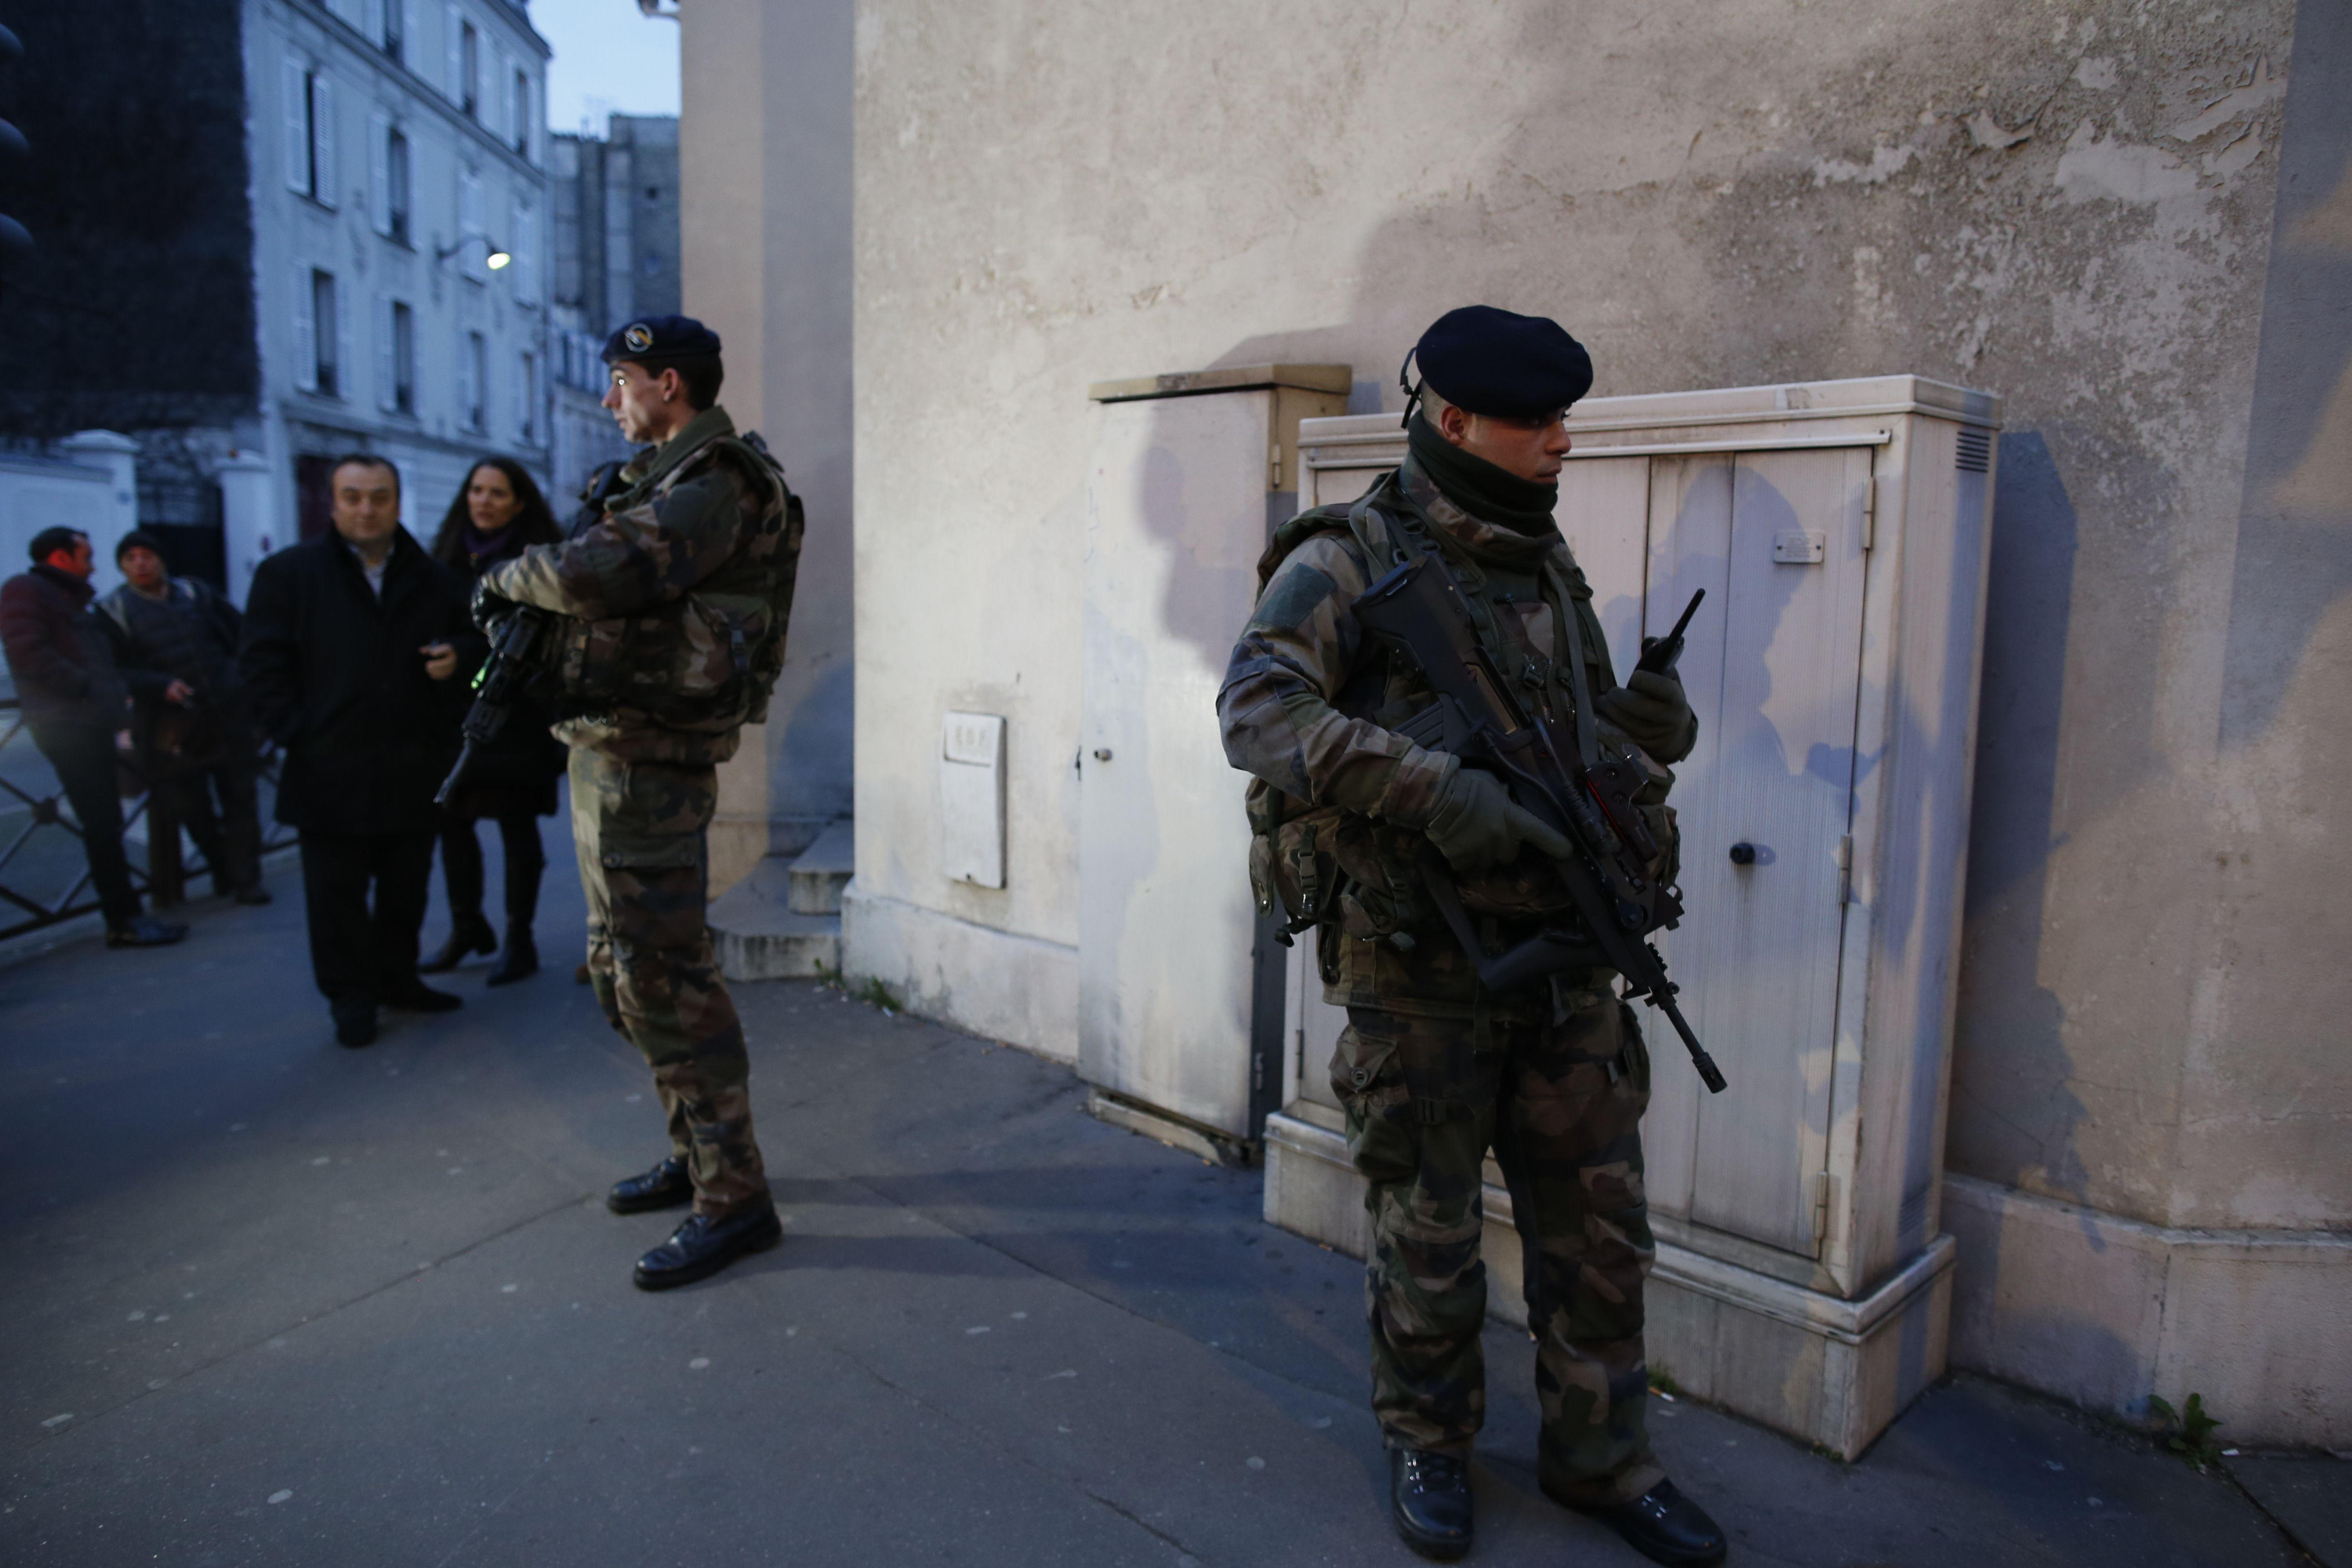 Operatiune anti-jihadista �n Franta: cinci persoane au fost arestate